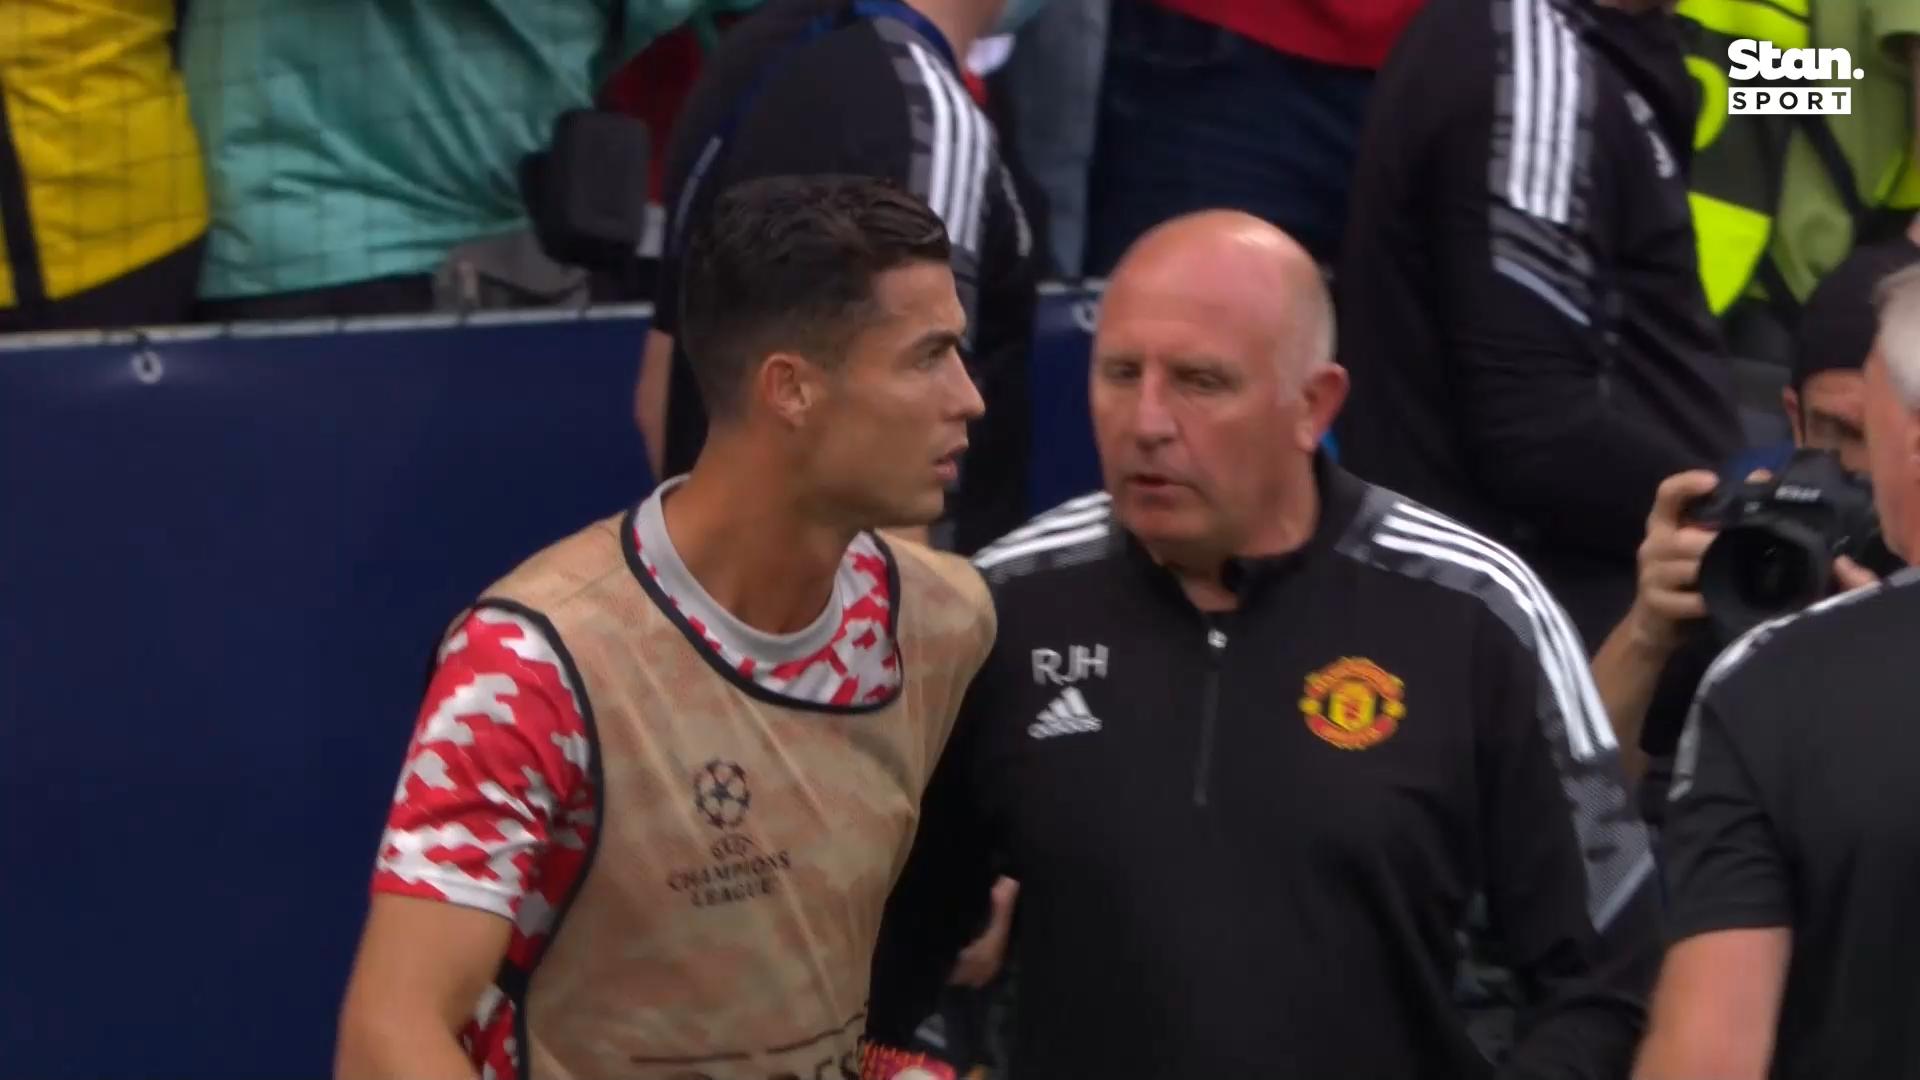 Ronaldo's classy gesture after hitting steward